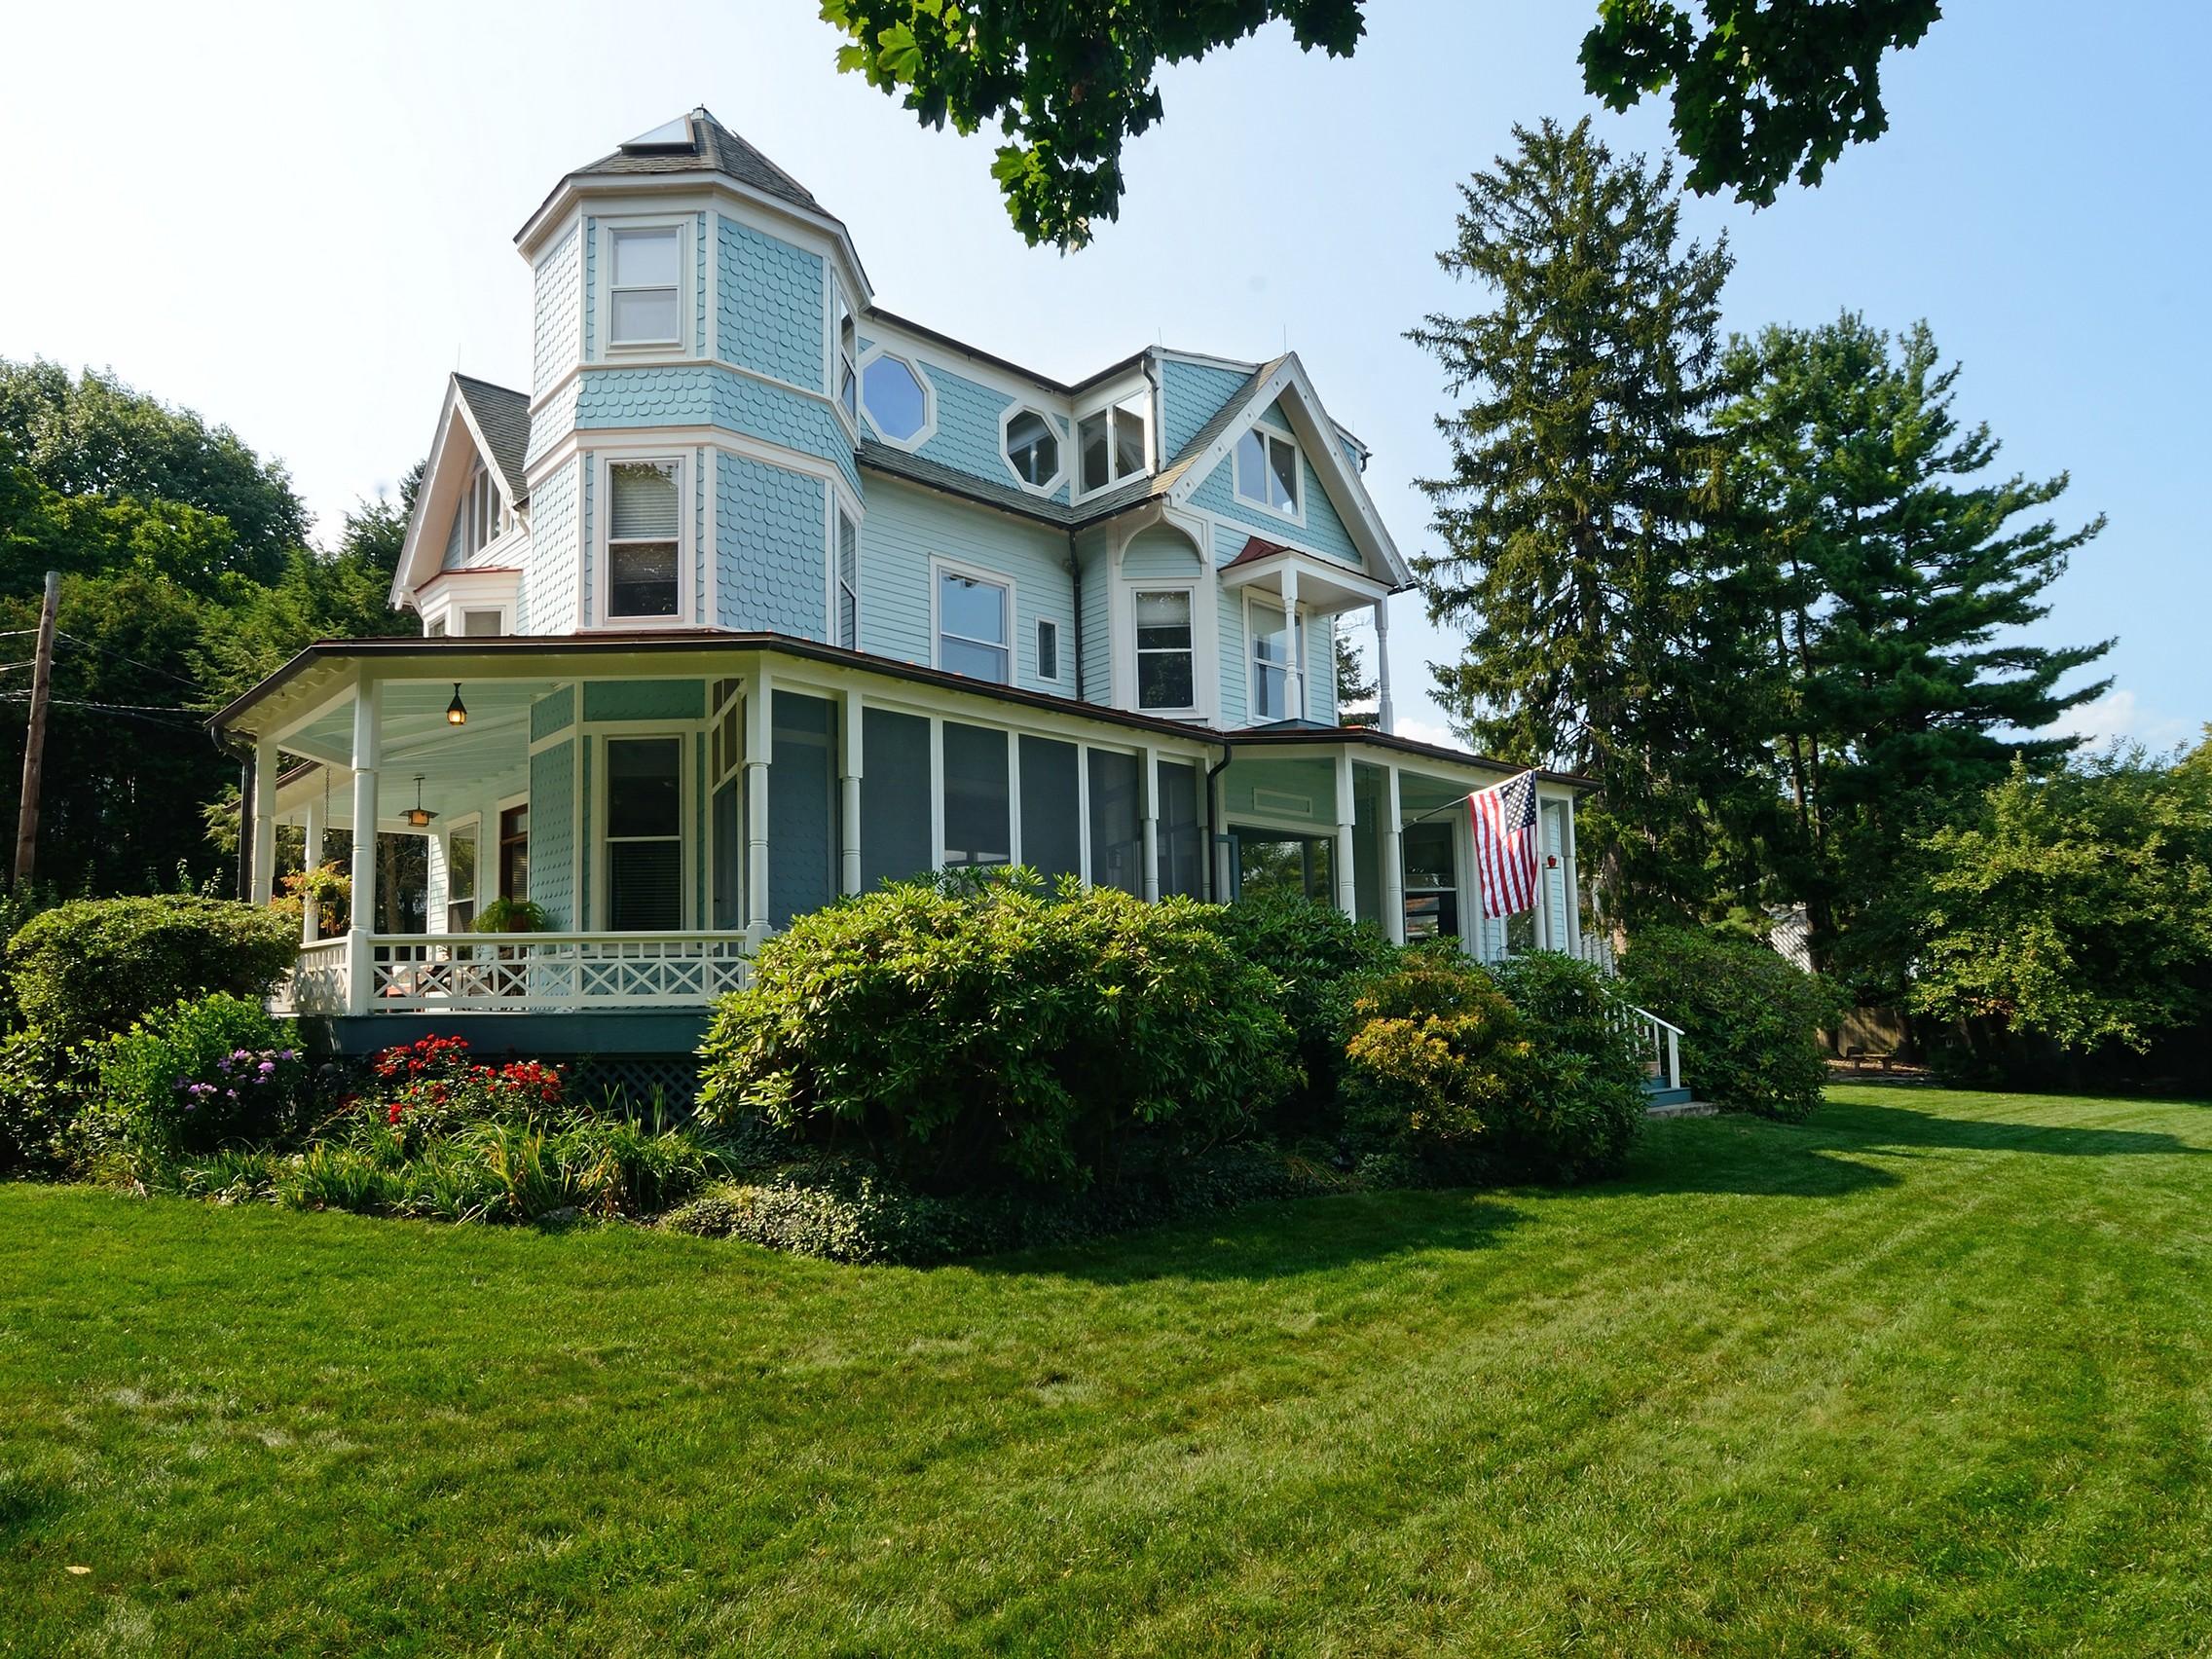 Single Family Home for Sale at Sandalwood on Hudson 2 La Veta Place Nyack, New York, 10960 United States